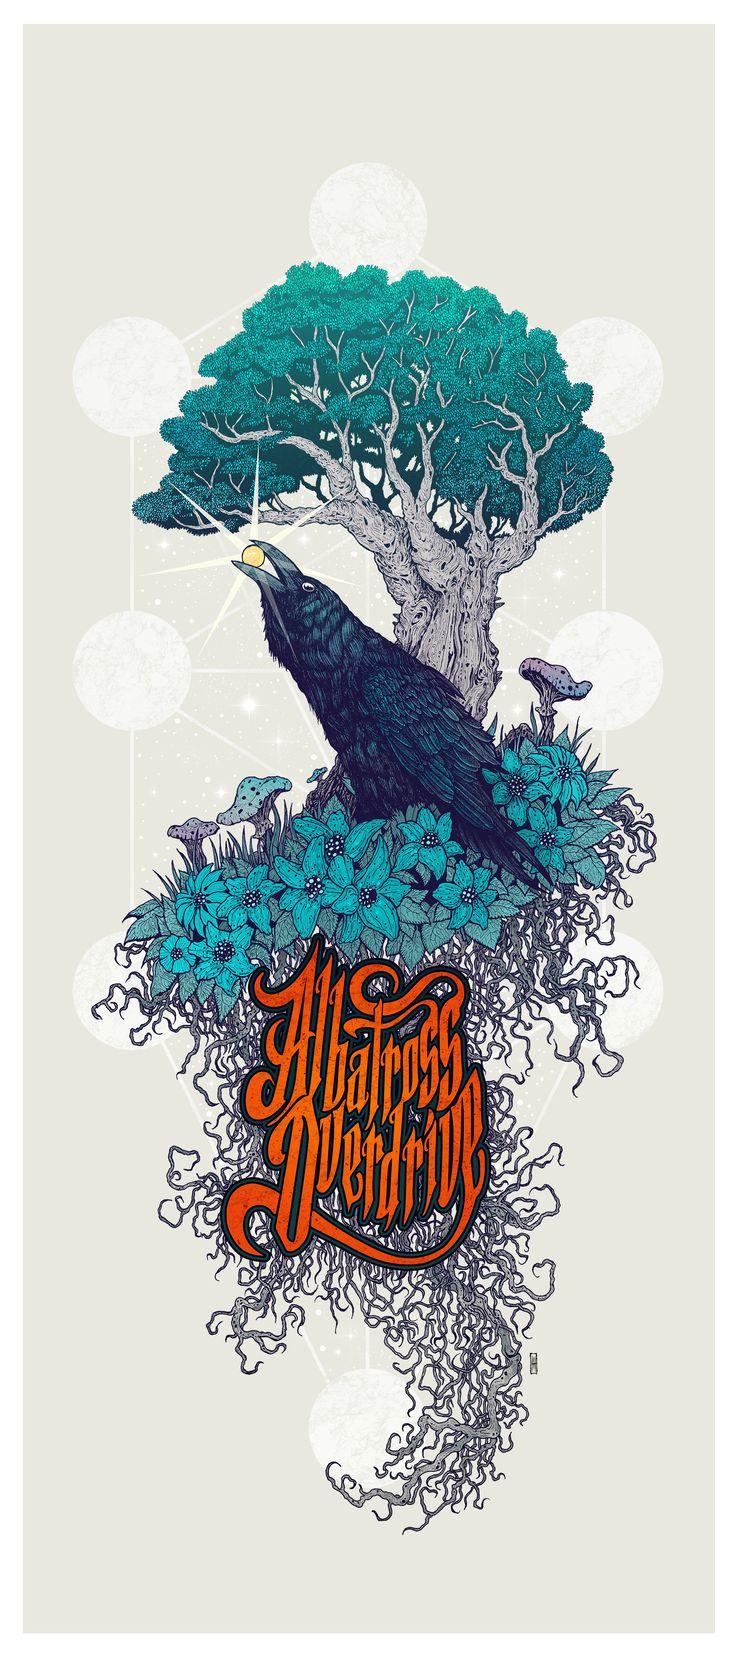 Albatross Overdrive (US) - band artwork -  color version #stonerrock #posterartwork #raven #mihaimanescu #penandink #treeoflife #symbolism